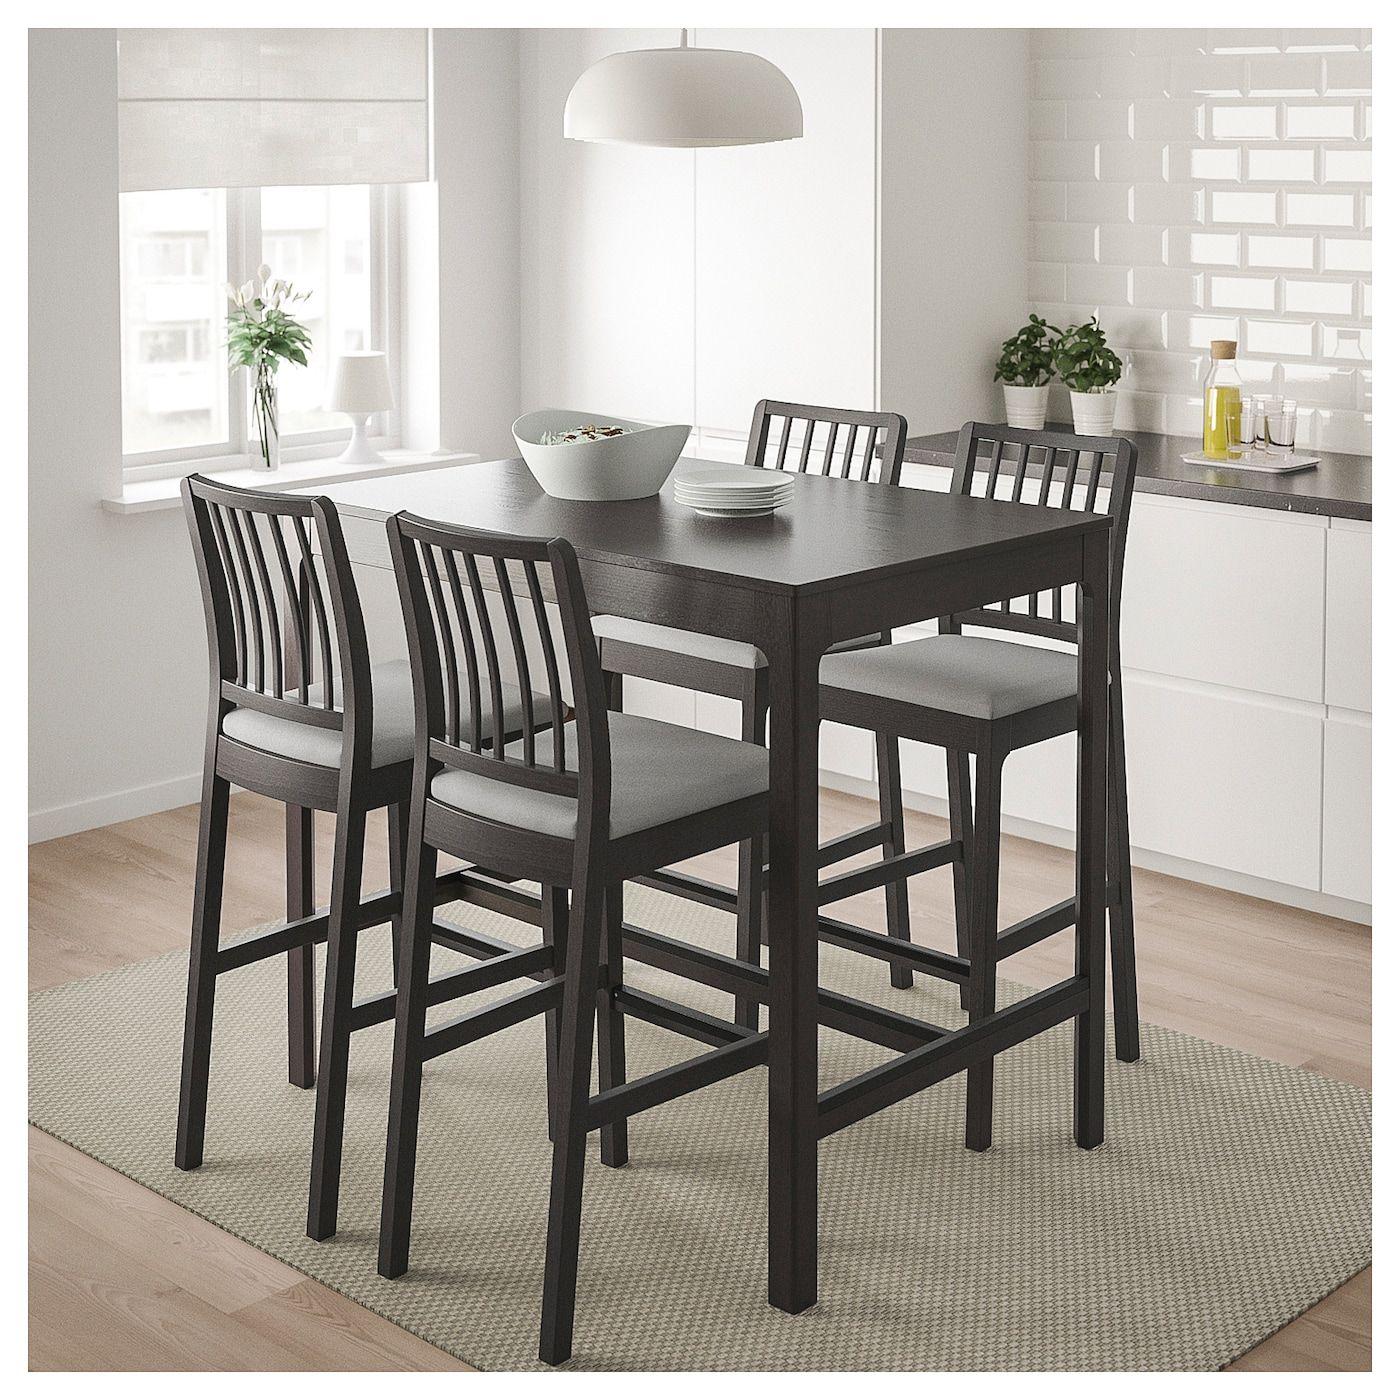 Ekedalen Bar Table Dark Brown 47 1 4x31 1 2 Bar Table Ikea